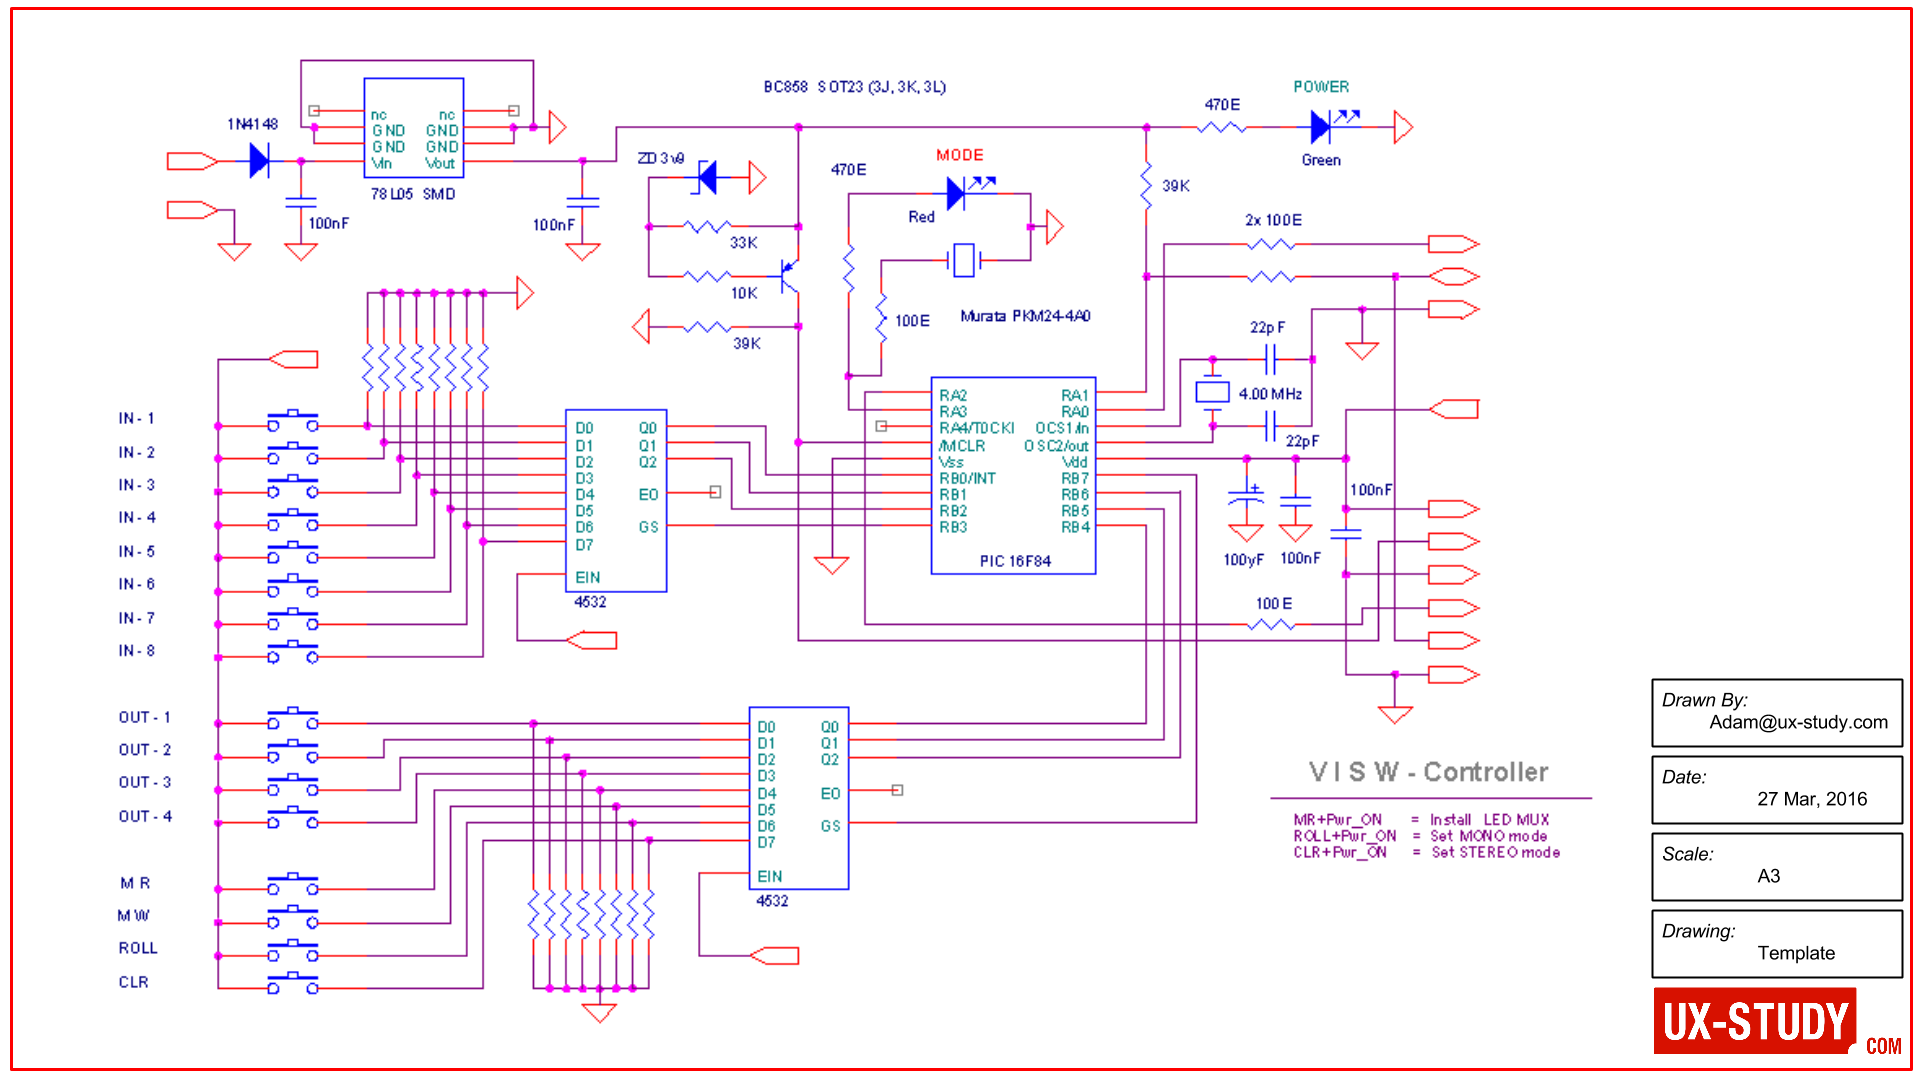 ux-study - AV schematic